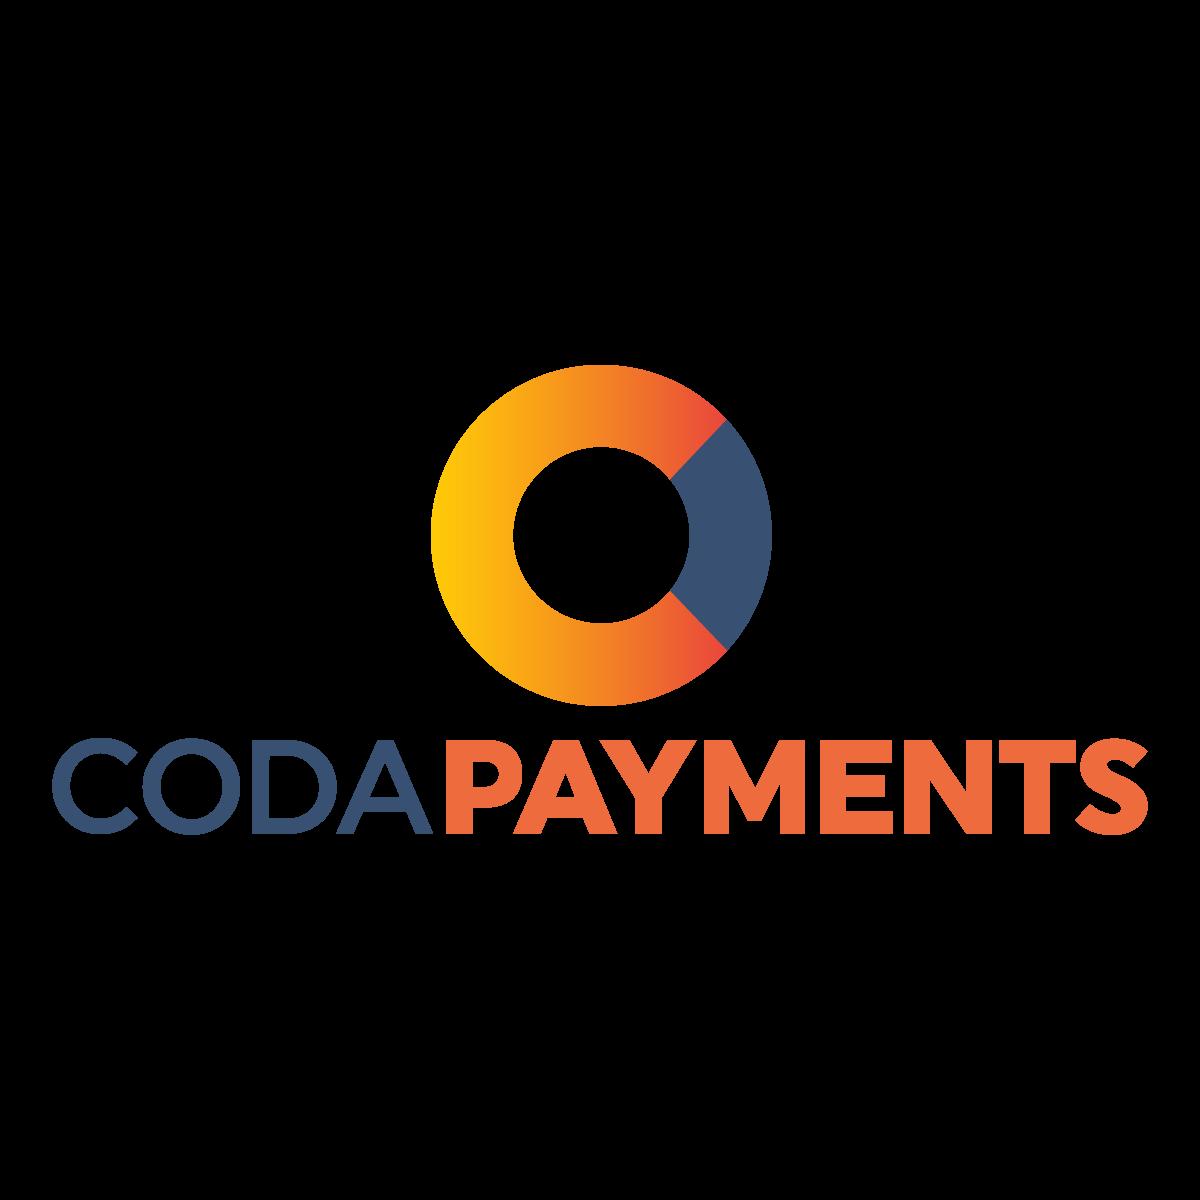 CodaPayments